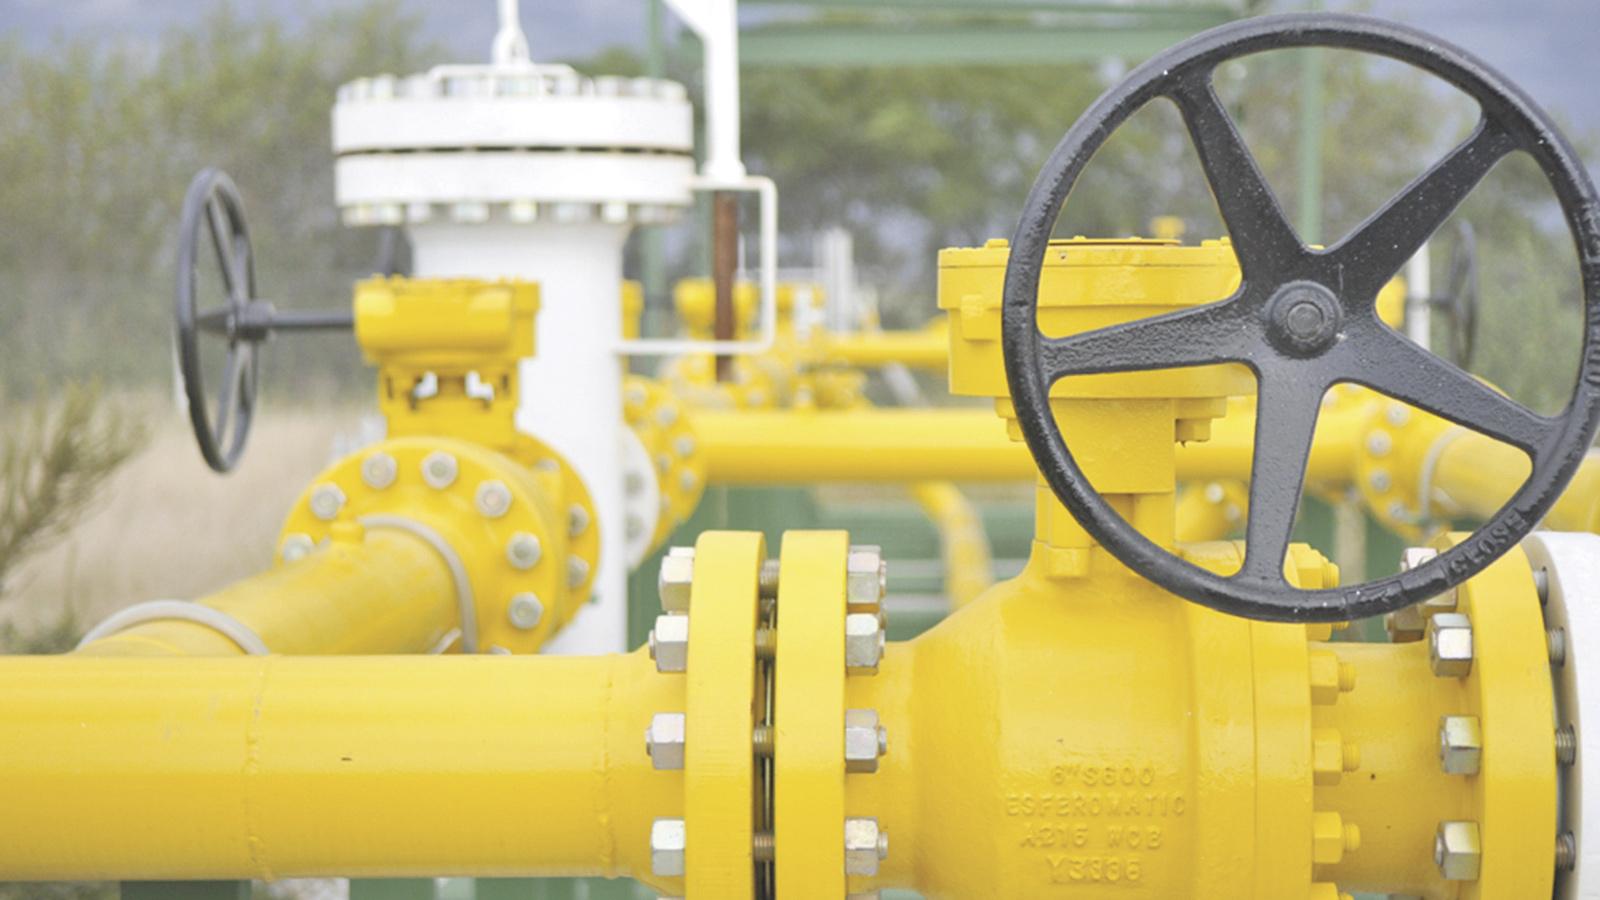 Fotos de portada aprende sobre gas natural for Imagenes de gas natural